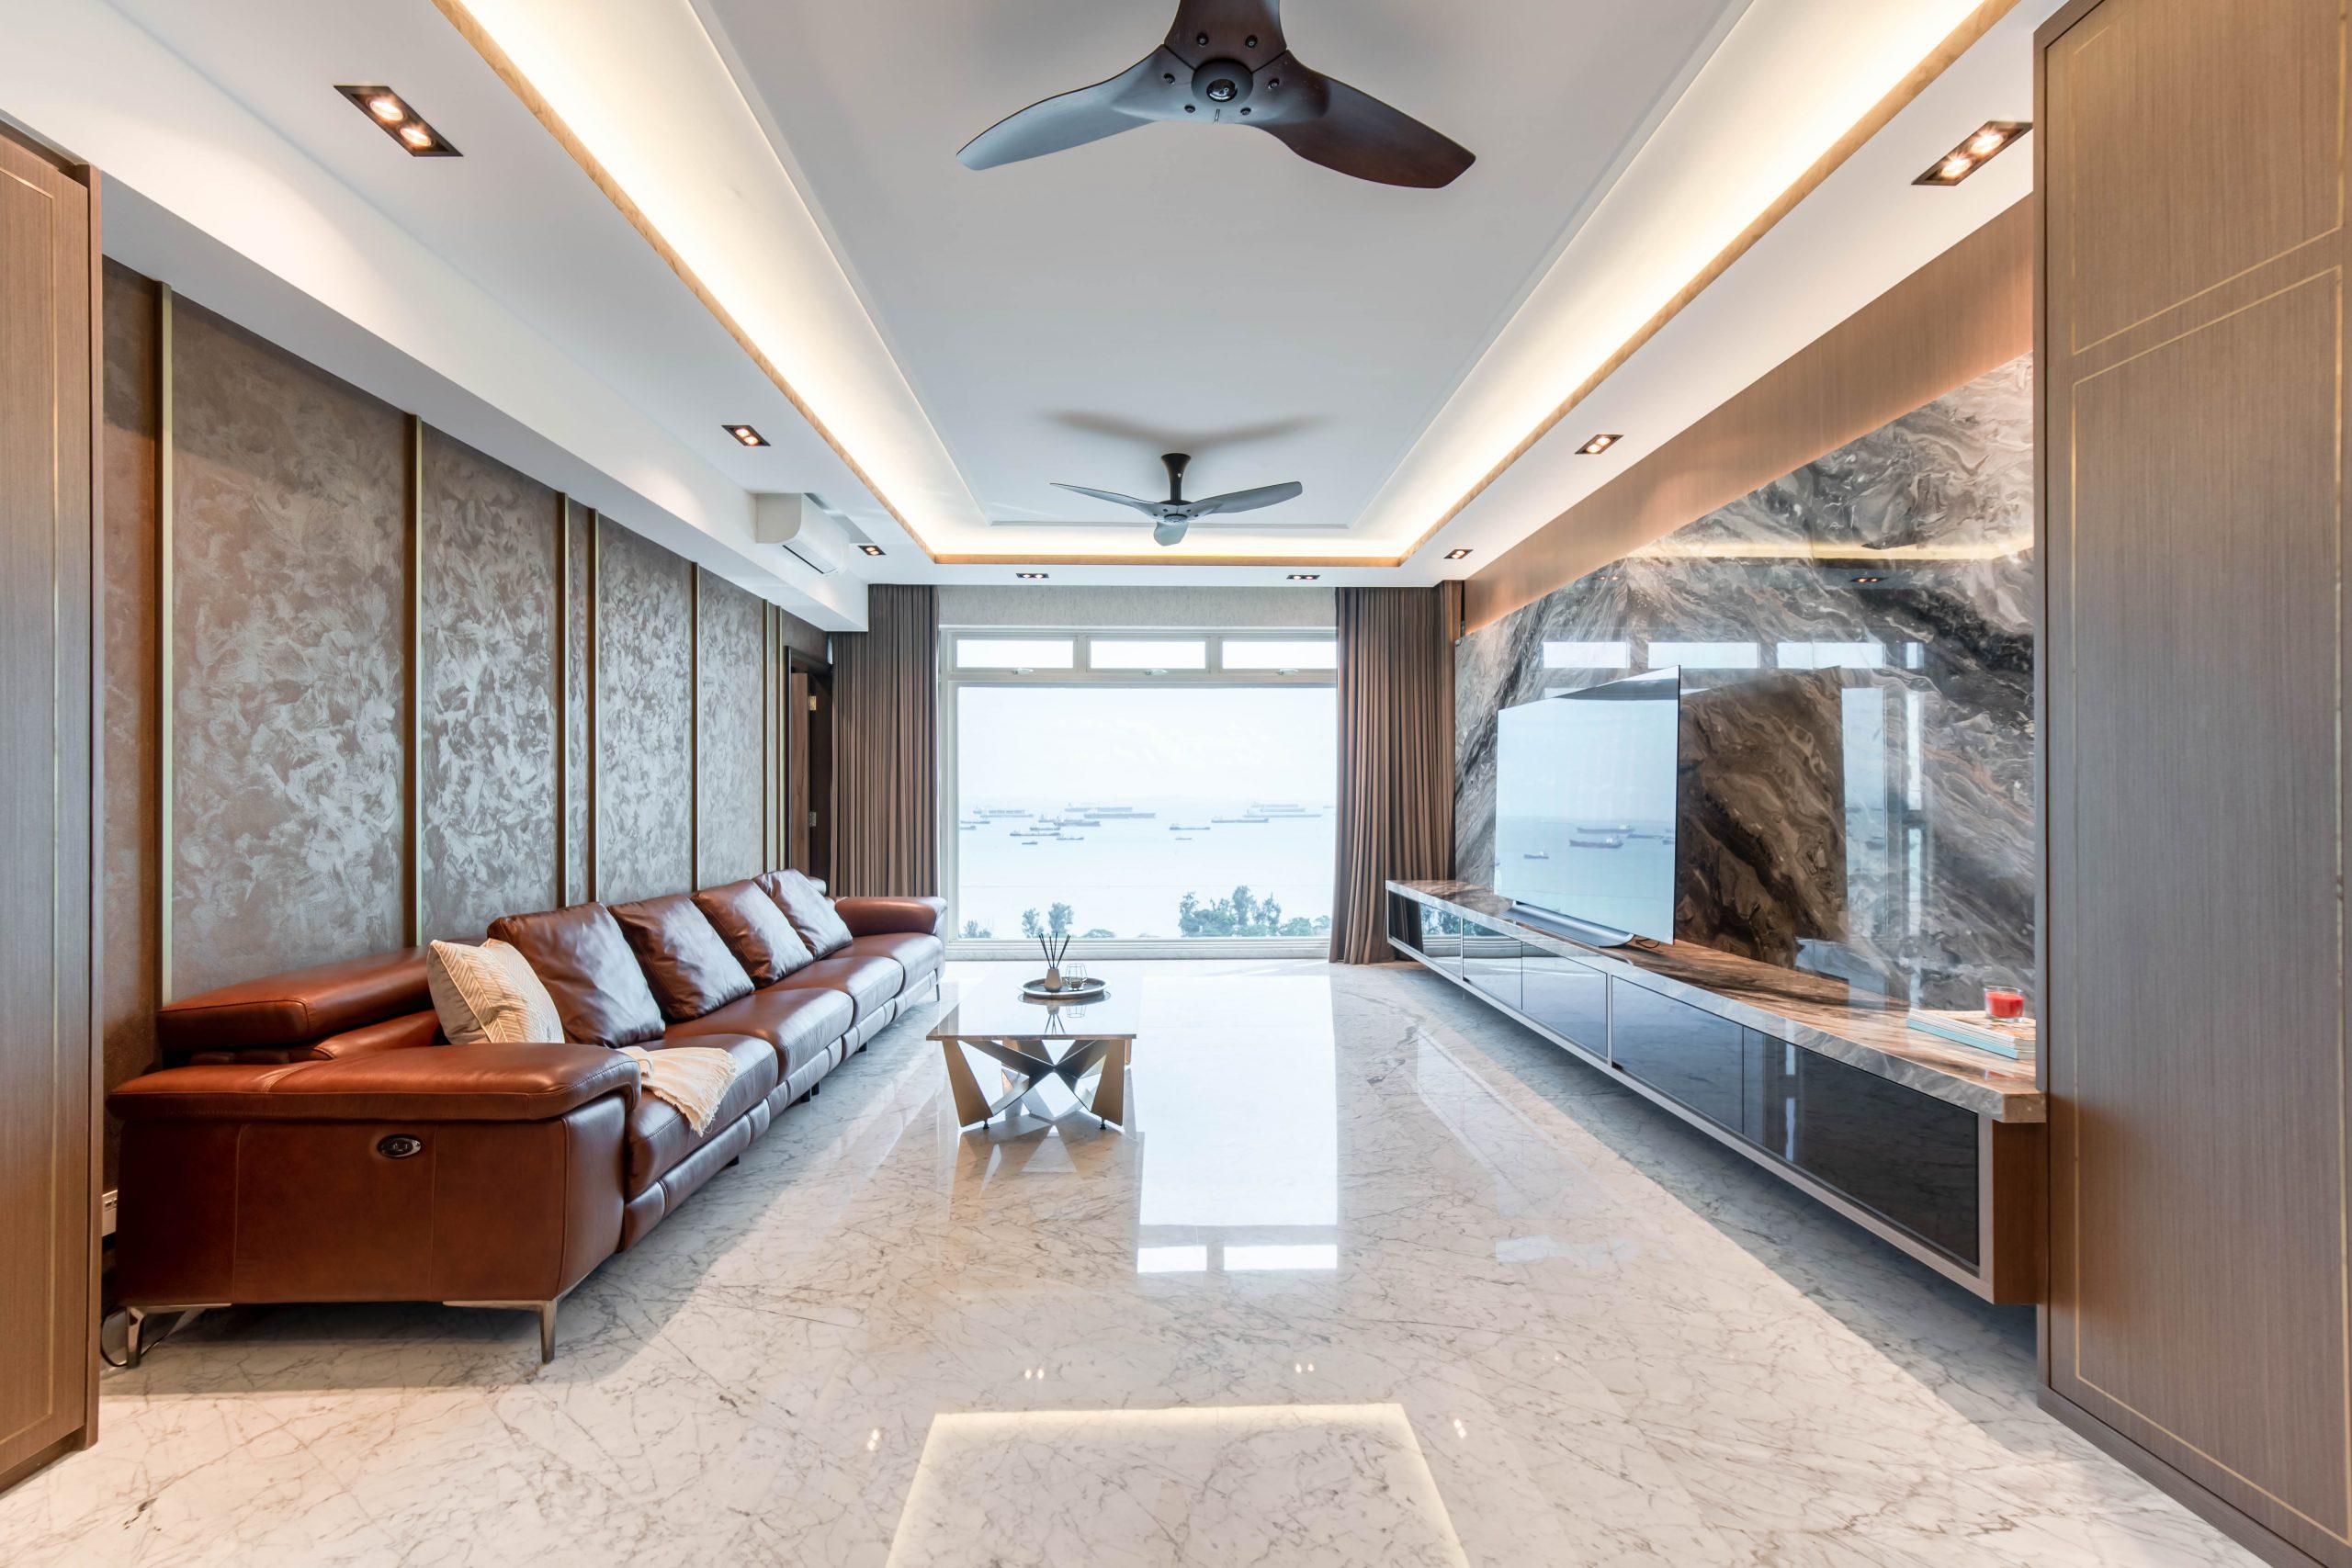 Costa Del Sol: $200k Luxury House Tour in Singapore